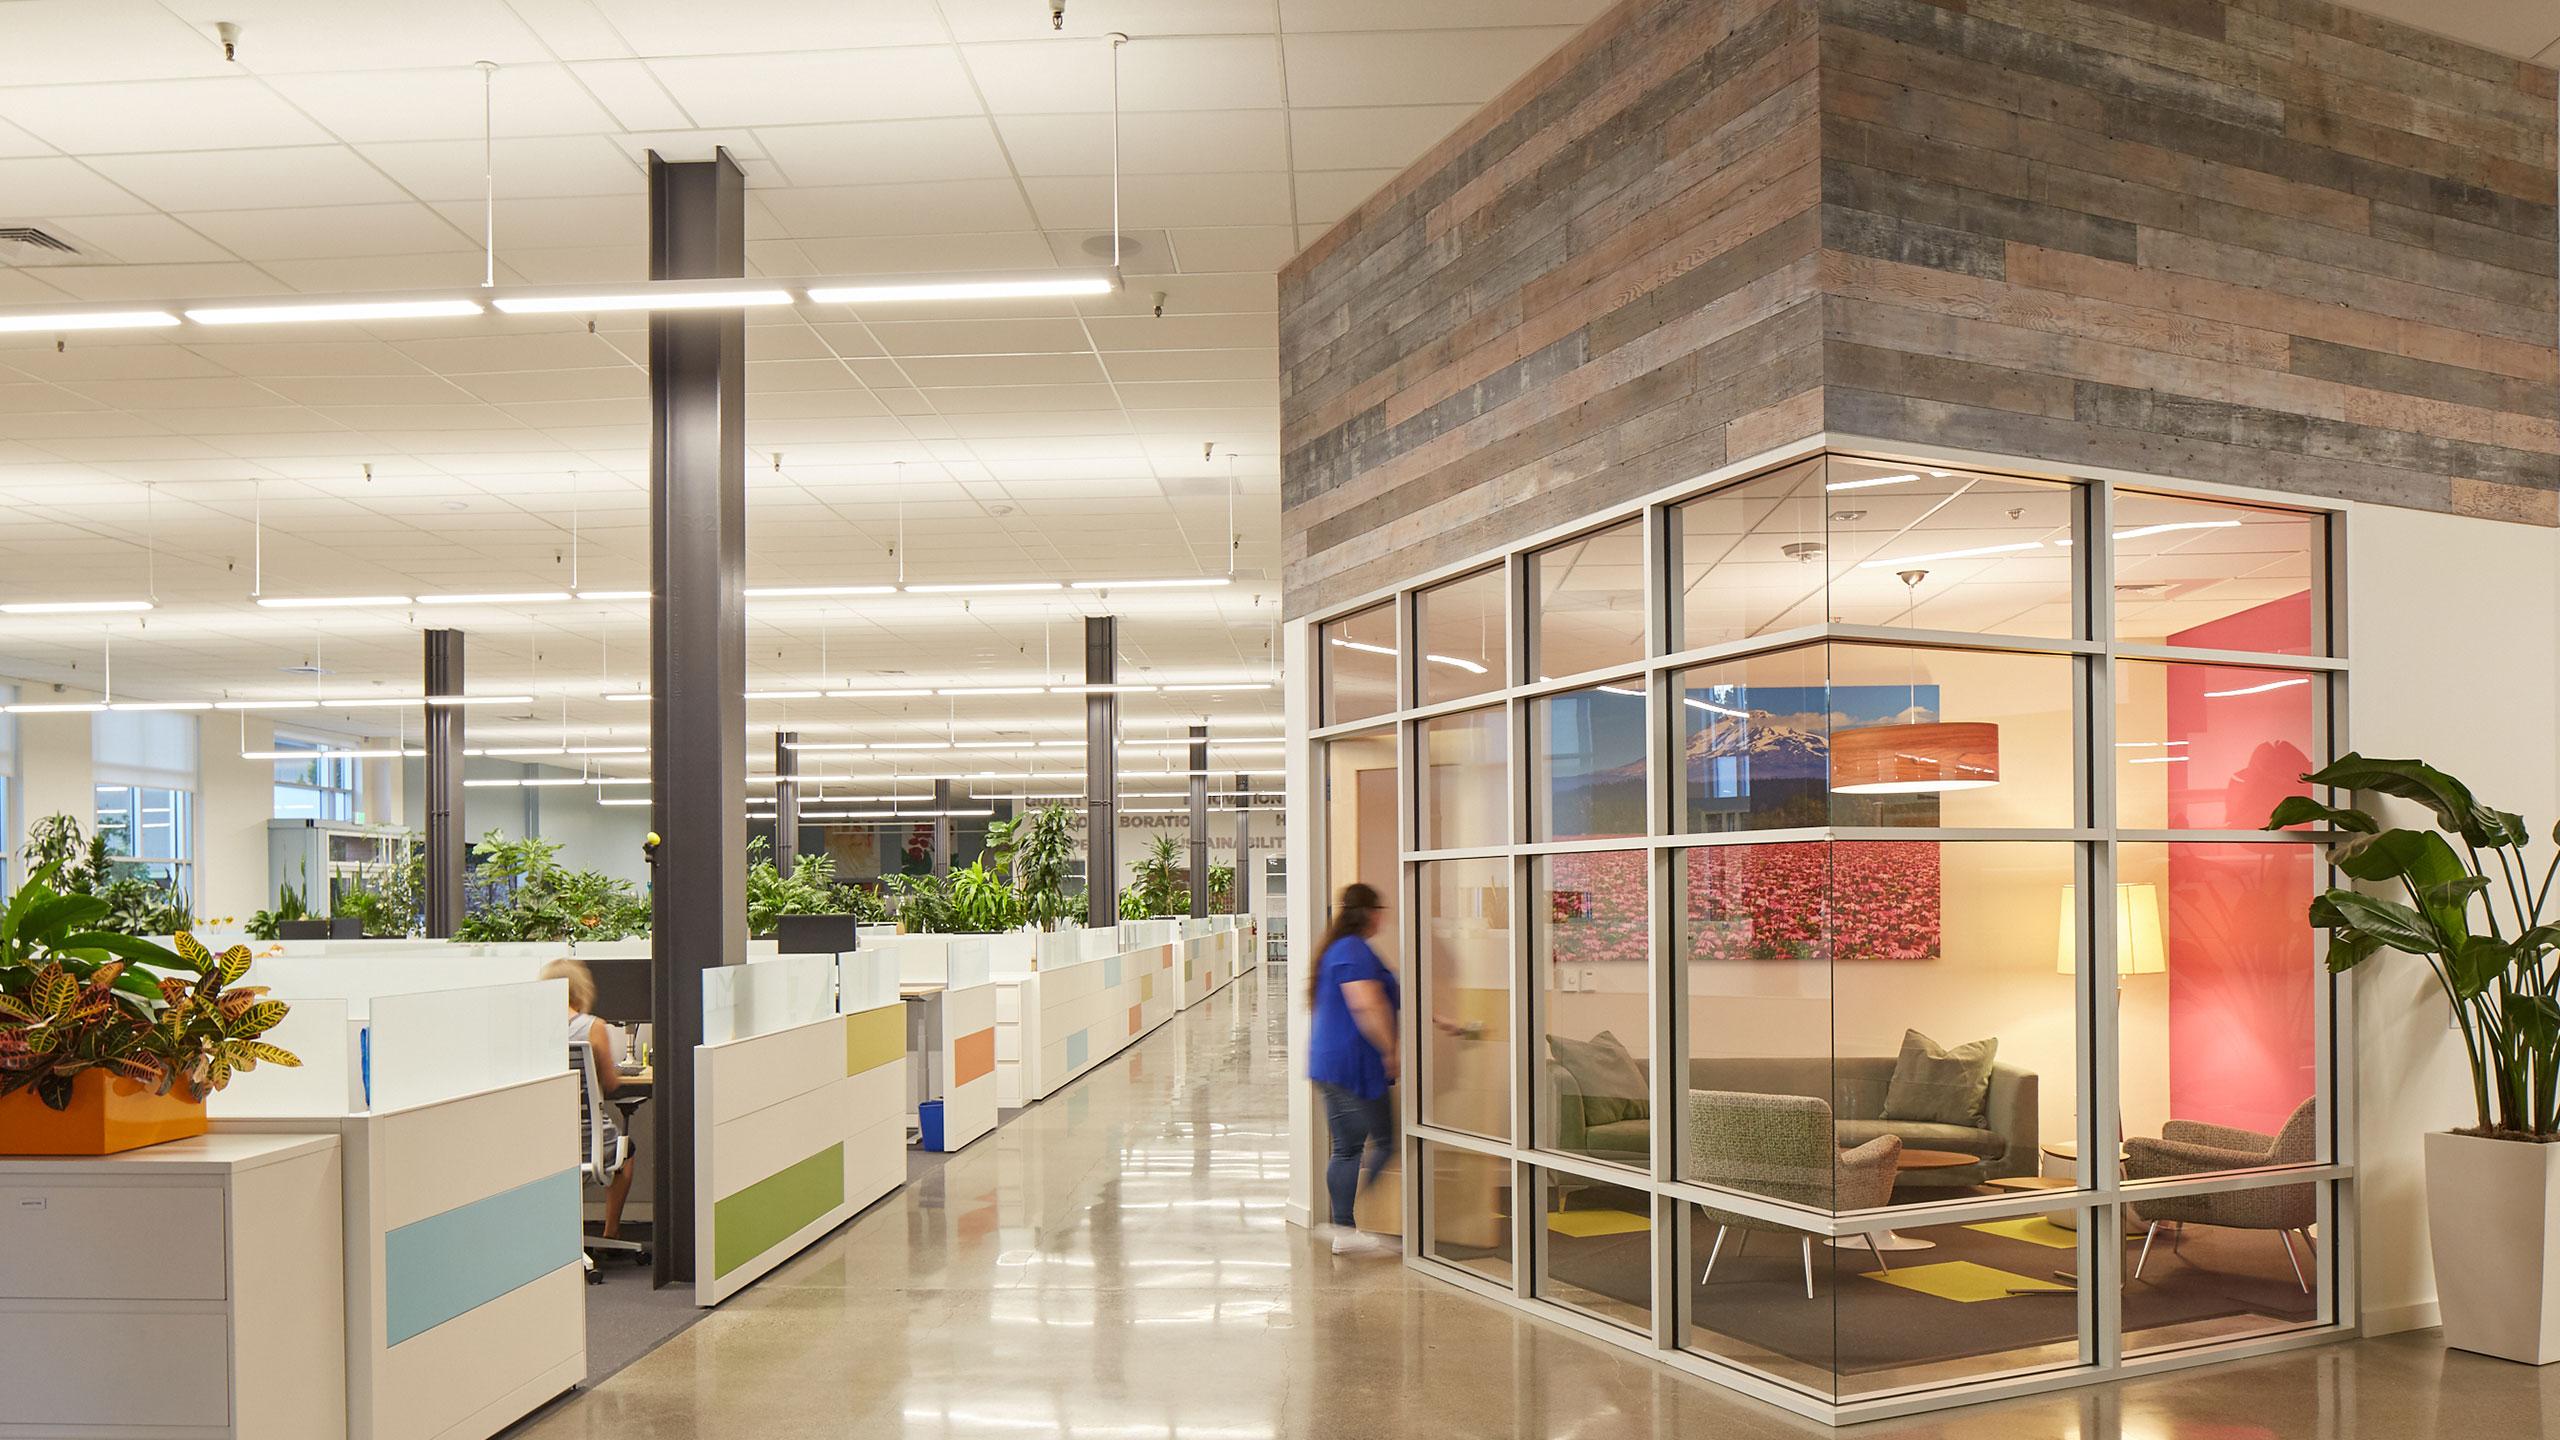 TMI-Tenant-Improvements-Sonoma-County-open-office-design